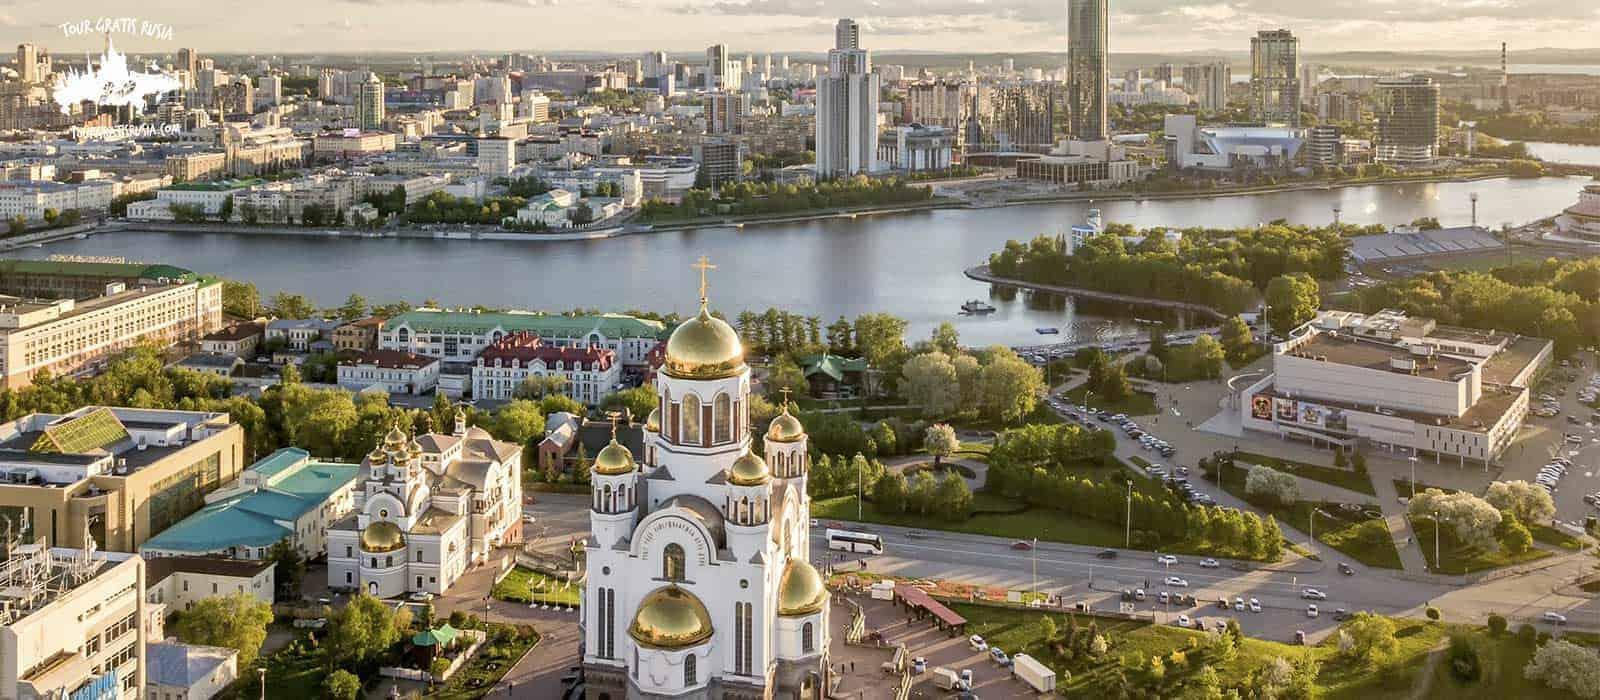 Tour Ciudad Cosmopolita Ekaterimburgo